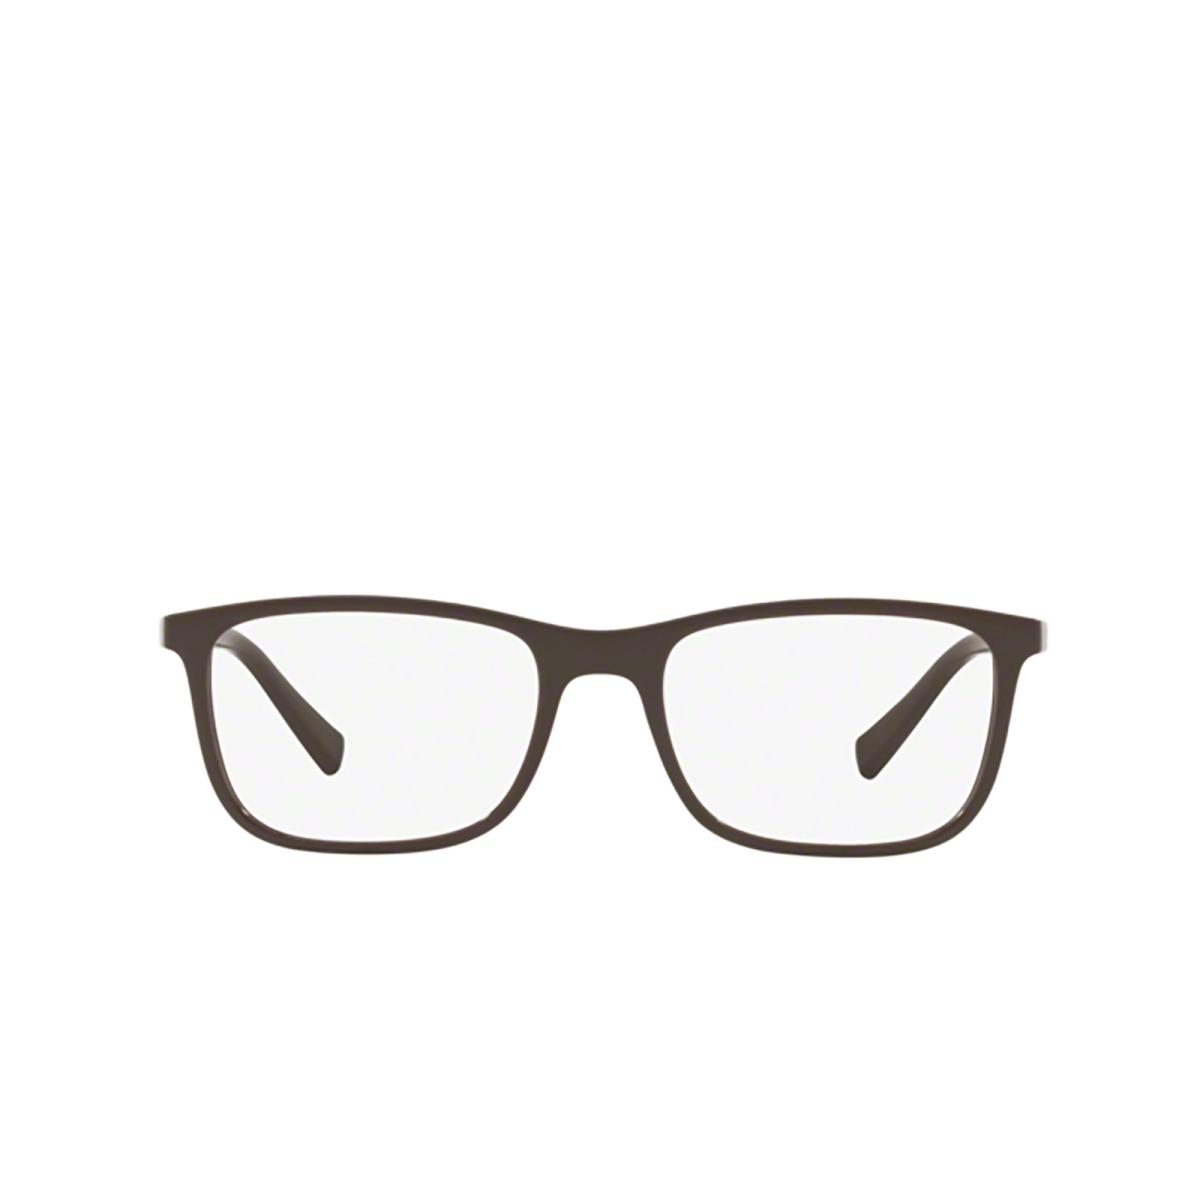 Dolce & Gabbana® Square Eyeglasses: DG5027 color 3159 - front view.